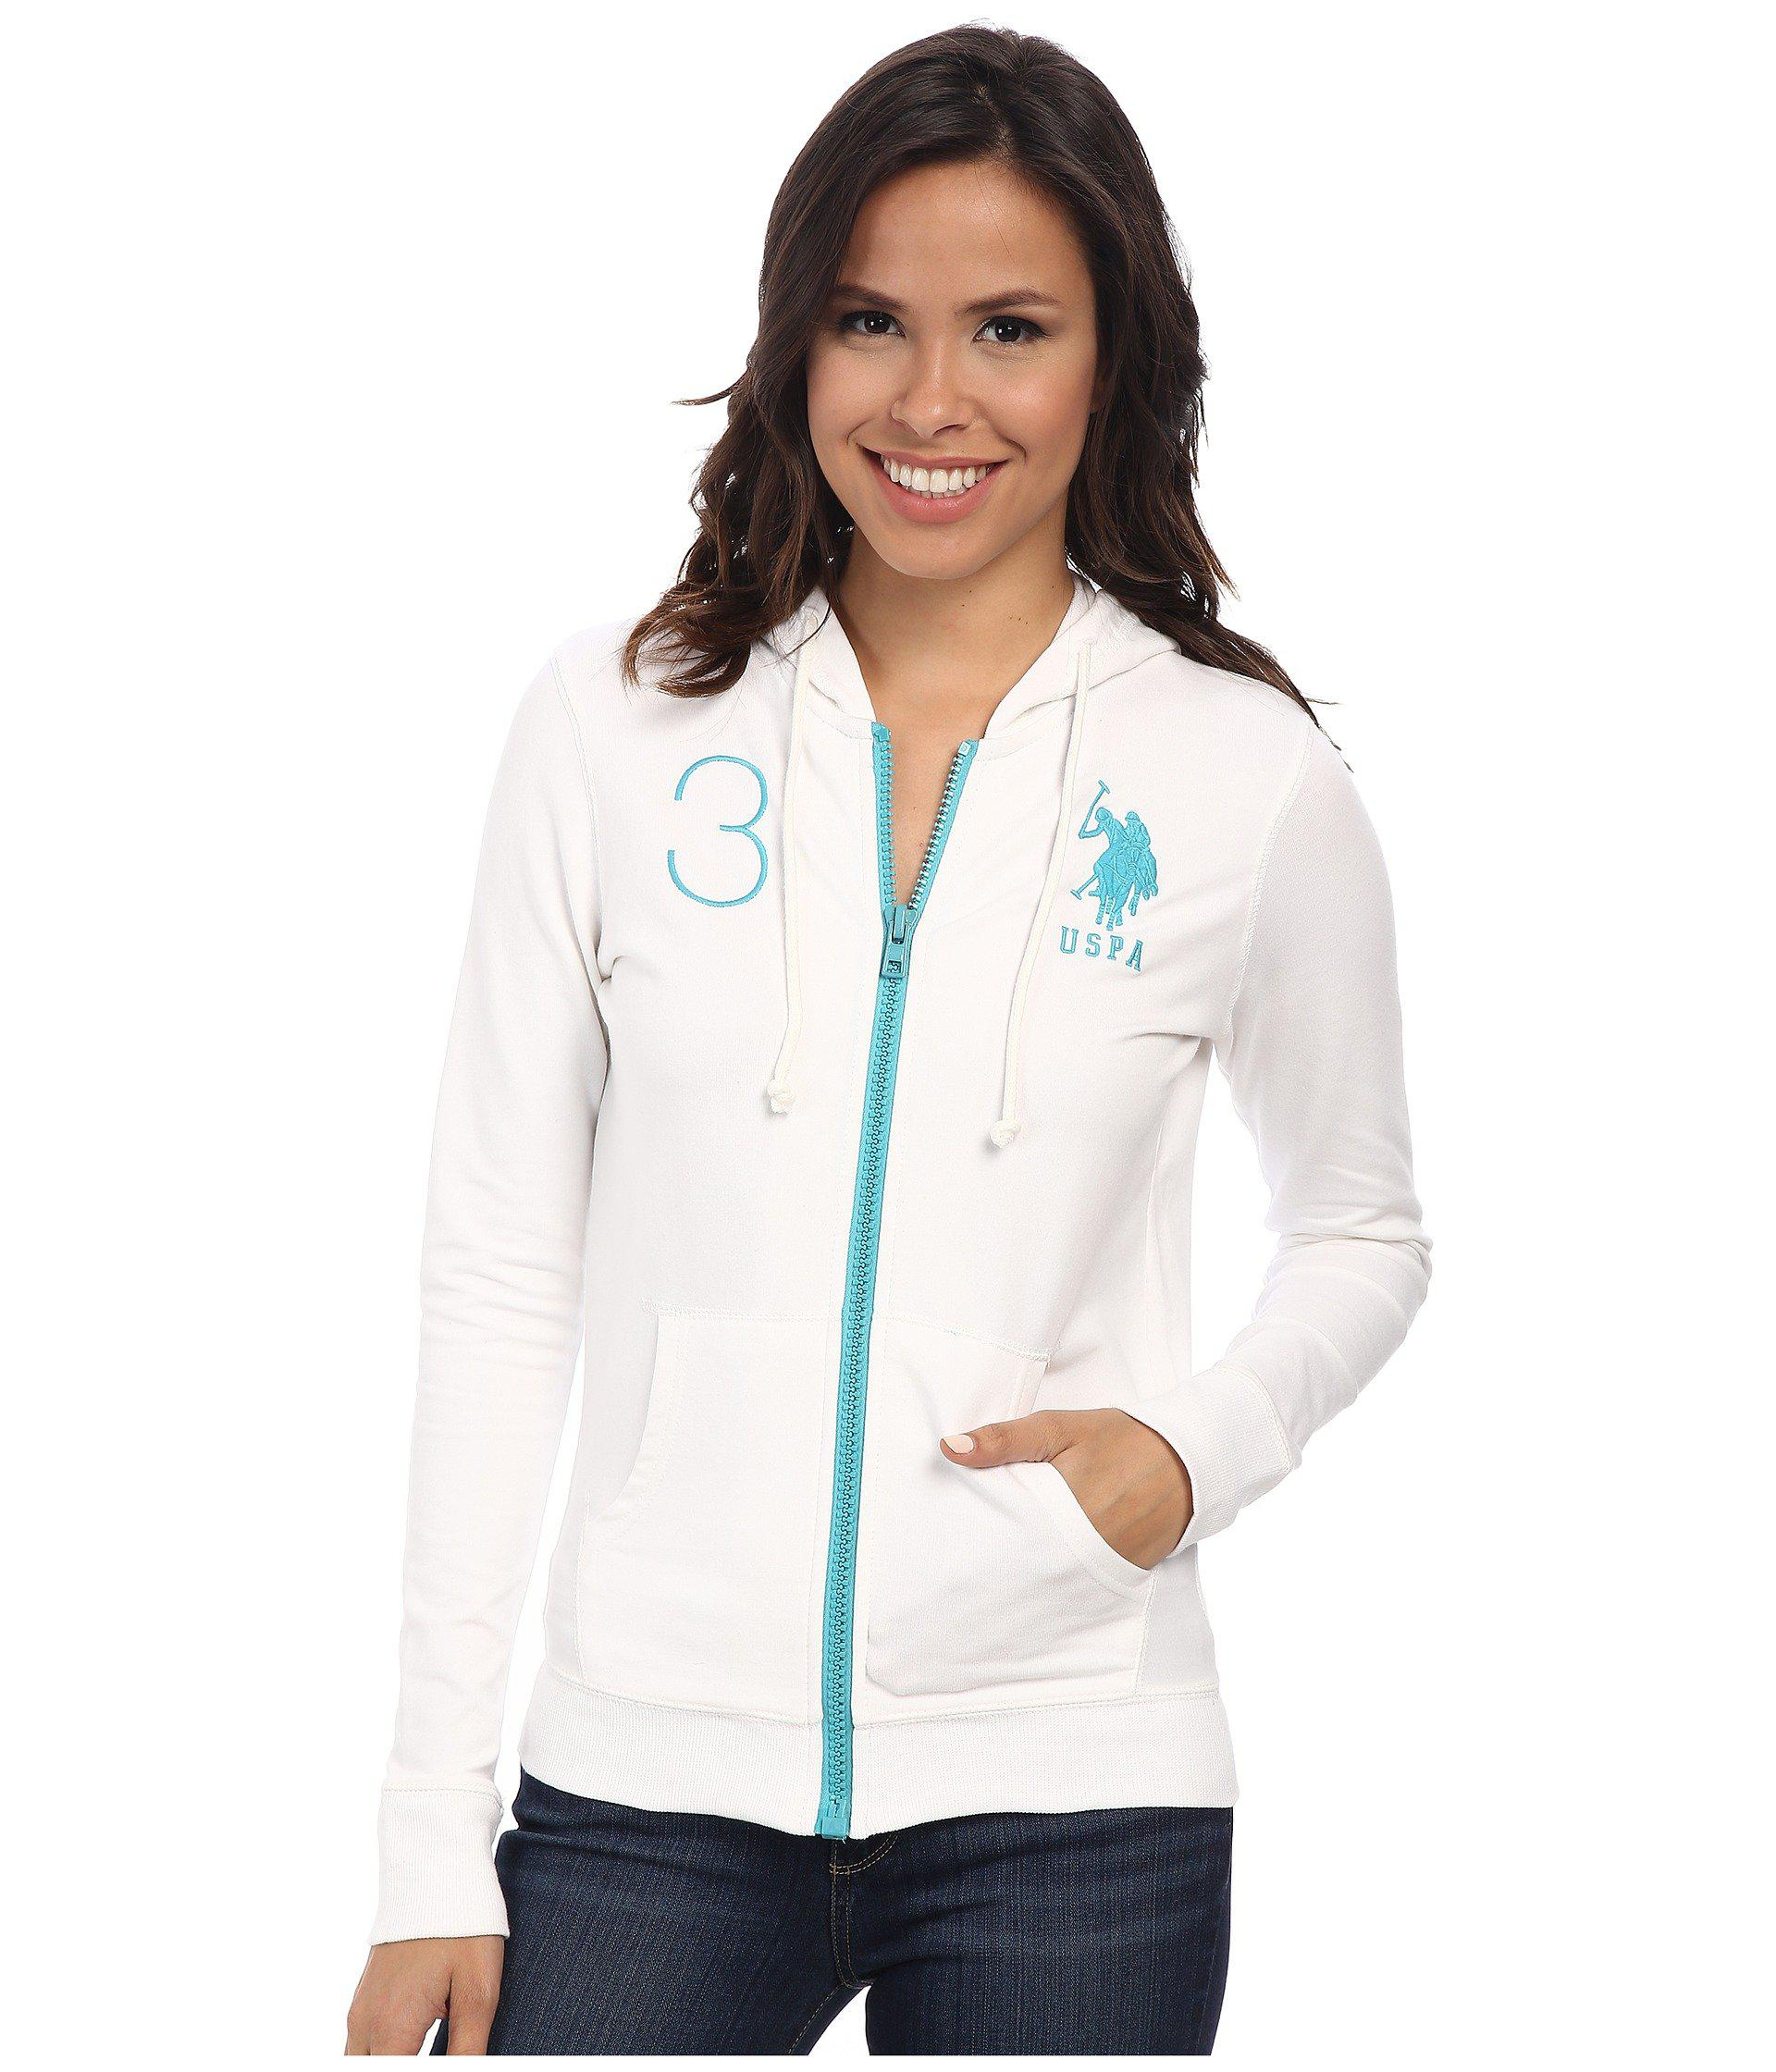 U.S. POLO ASSN. Womens Neon Pop French Terry Hoodie Optic White - Hoodies & Sweatshirts